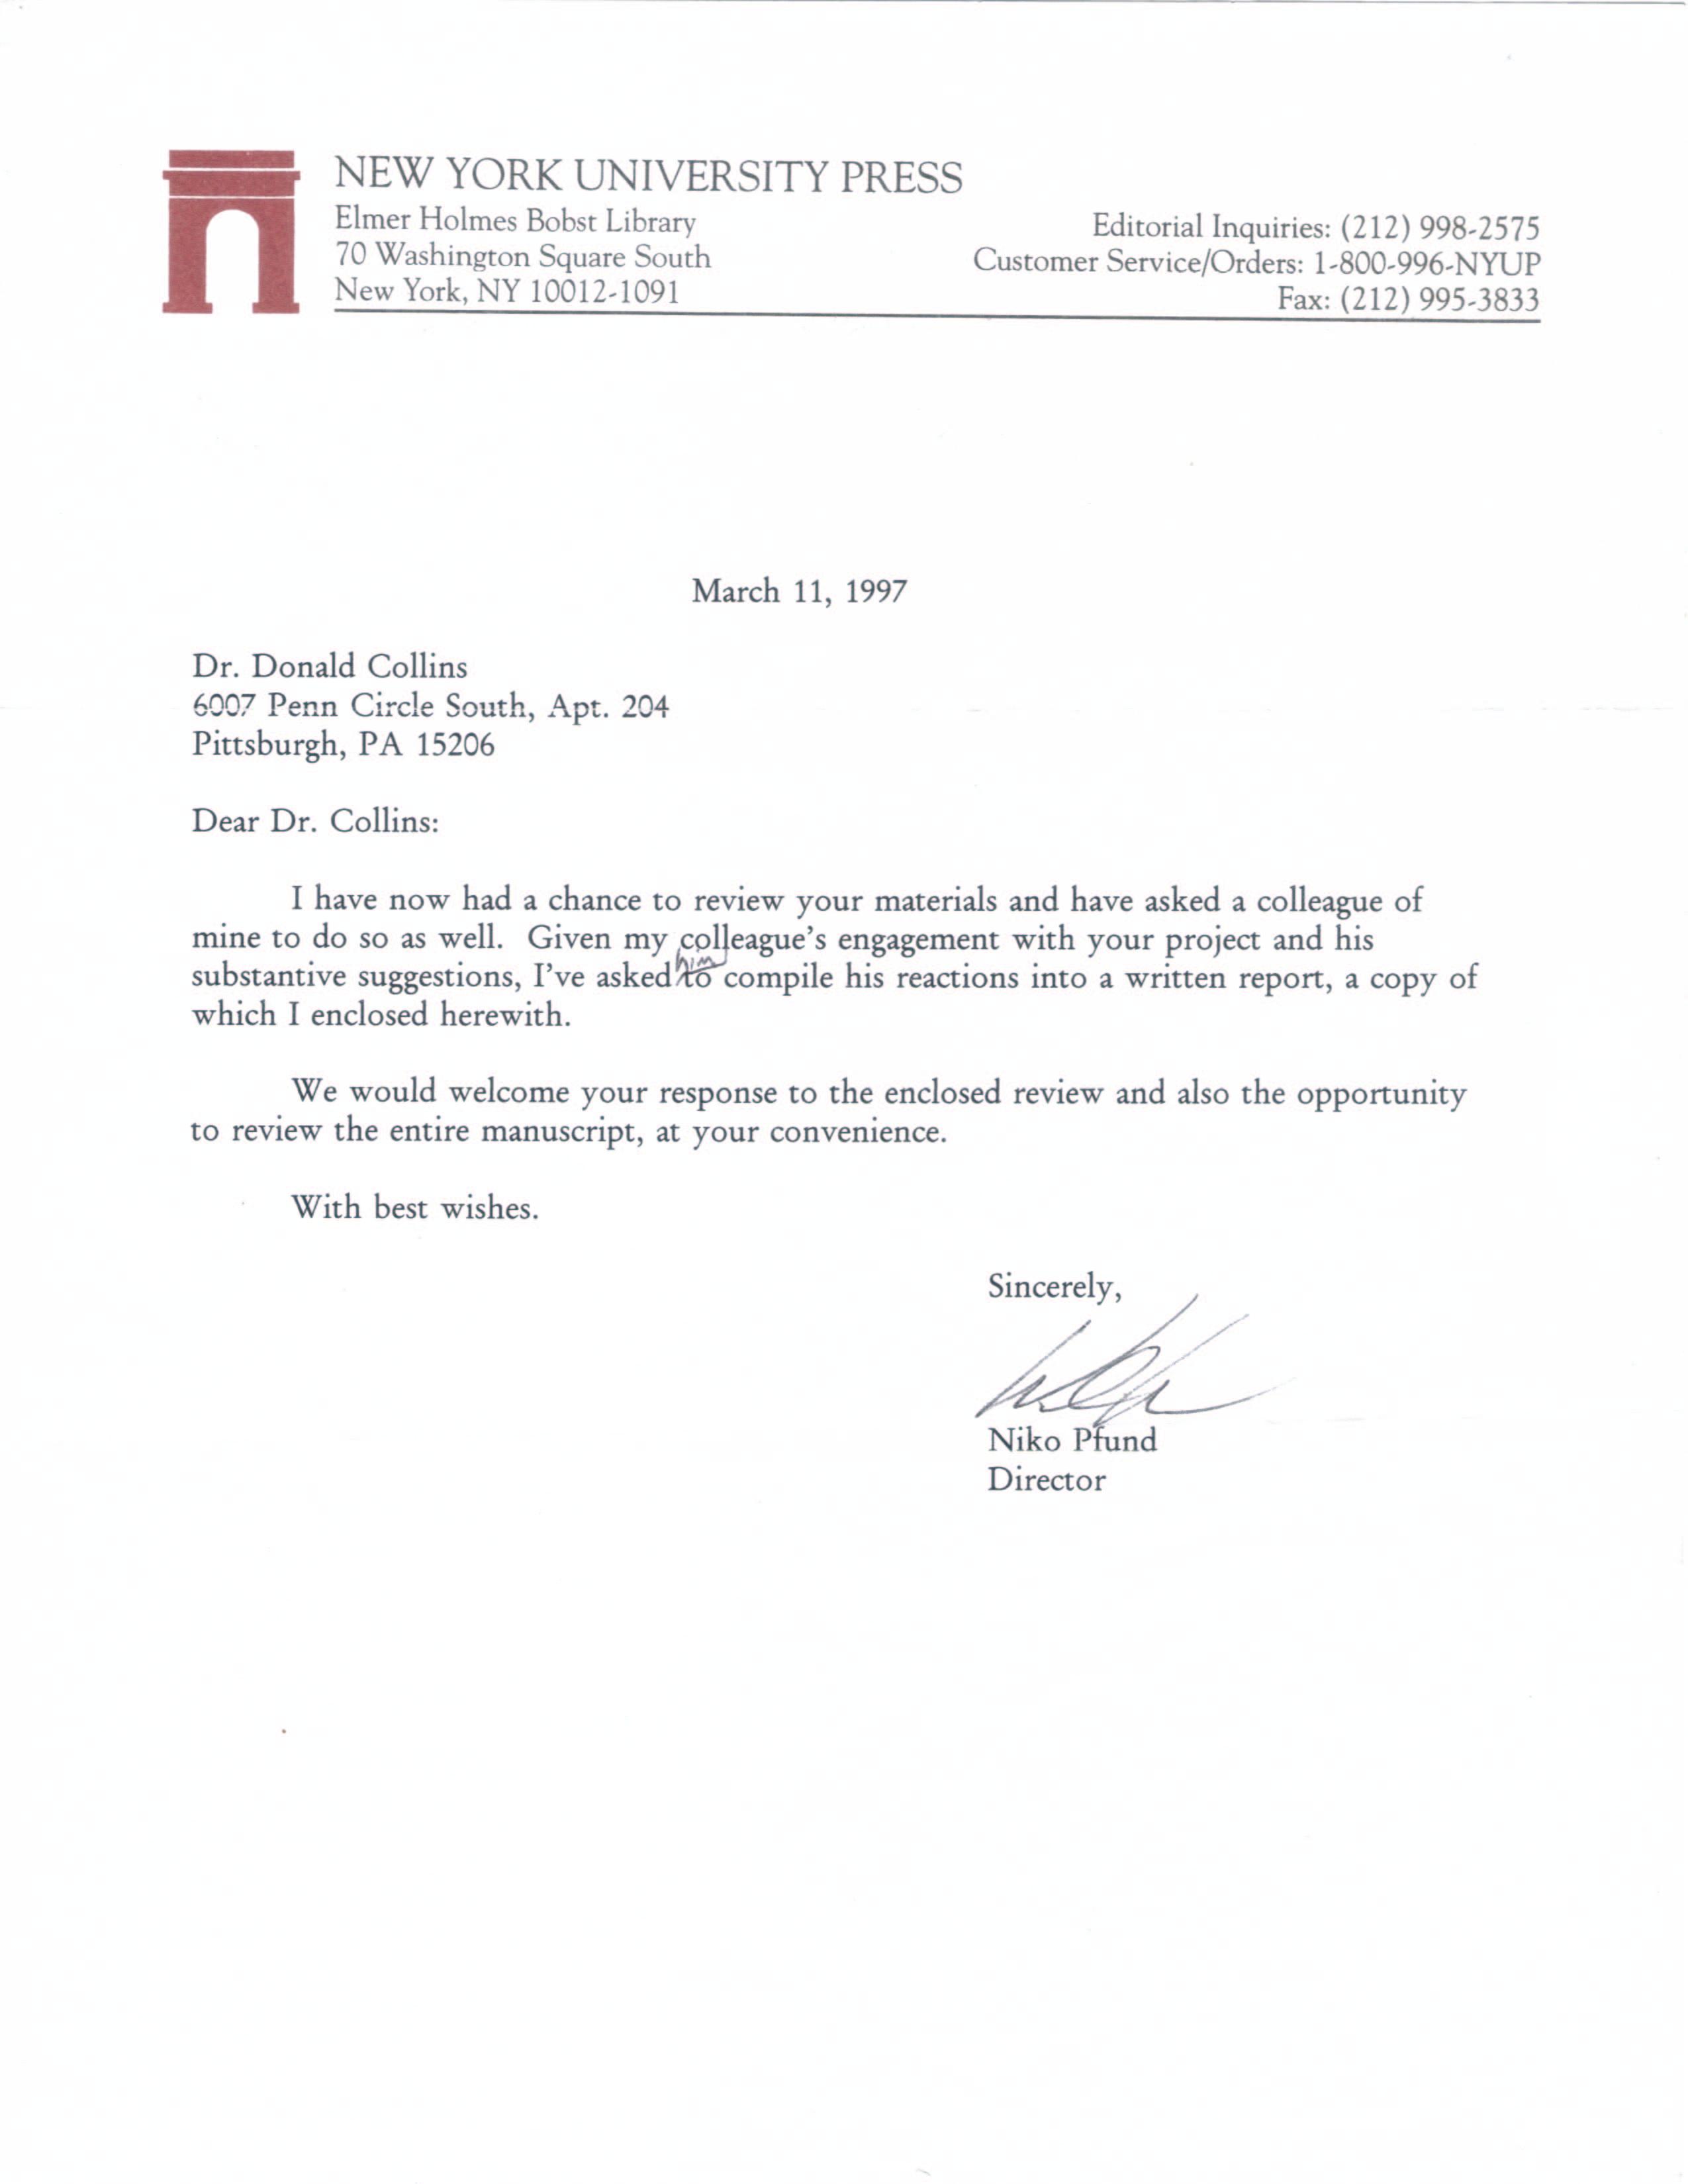 014 Why Penn Essay Colleges Nyu This I Believe Supplement Press Pfund L New York University Unforgettable 2018 Stern Reddit Full